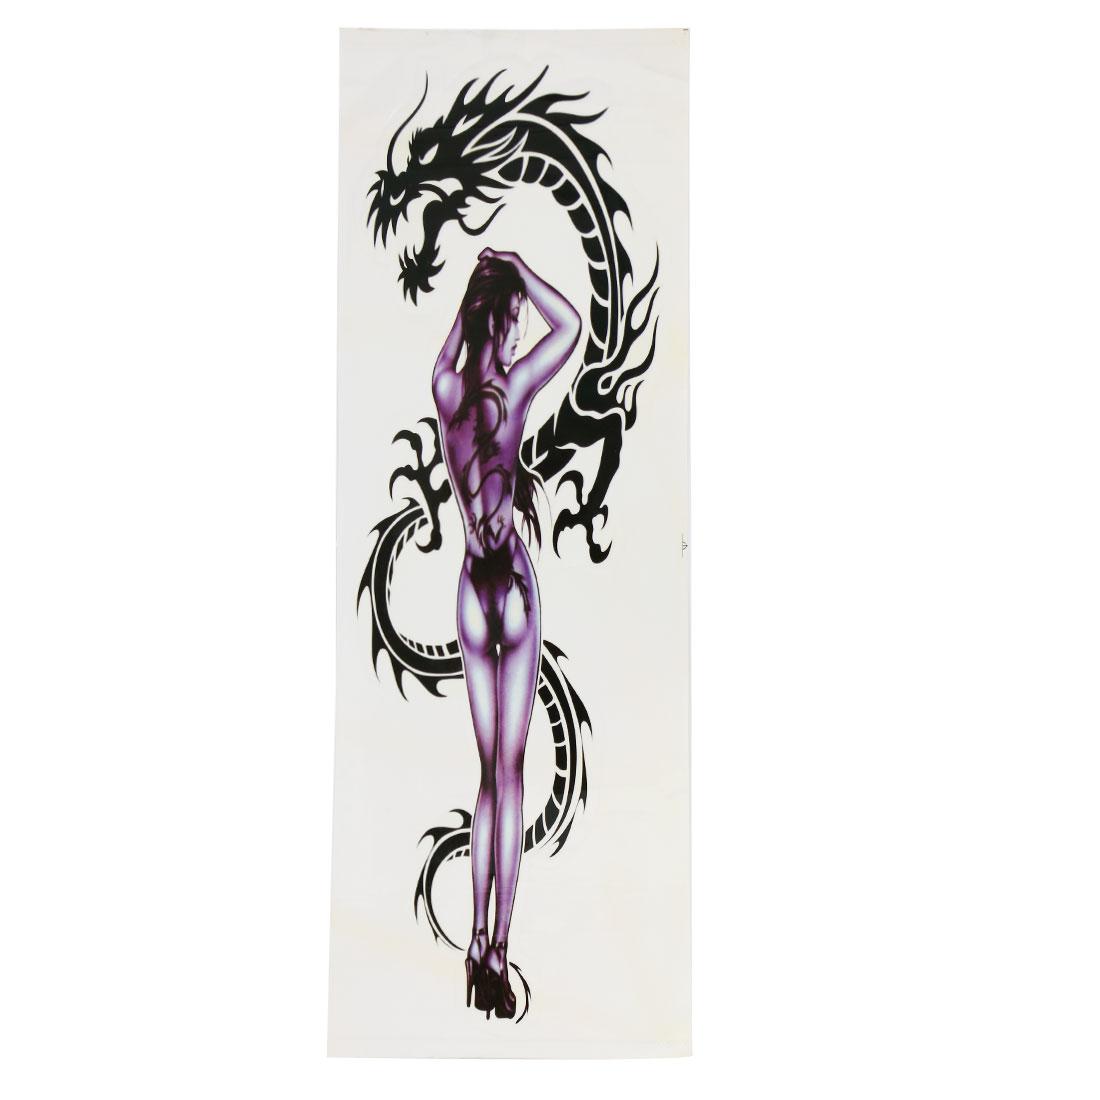 Car Body Self Adhesive Sticker Ornament Sexy Lady Dragon Print Graphic Decal